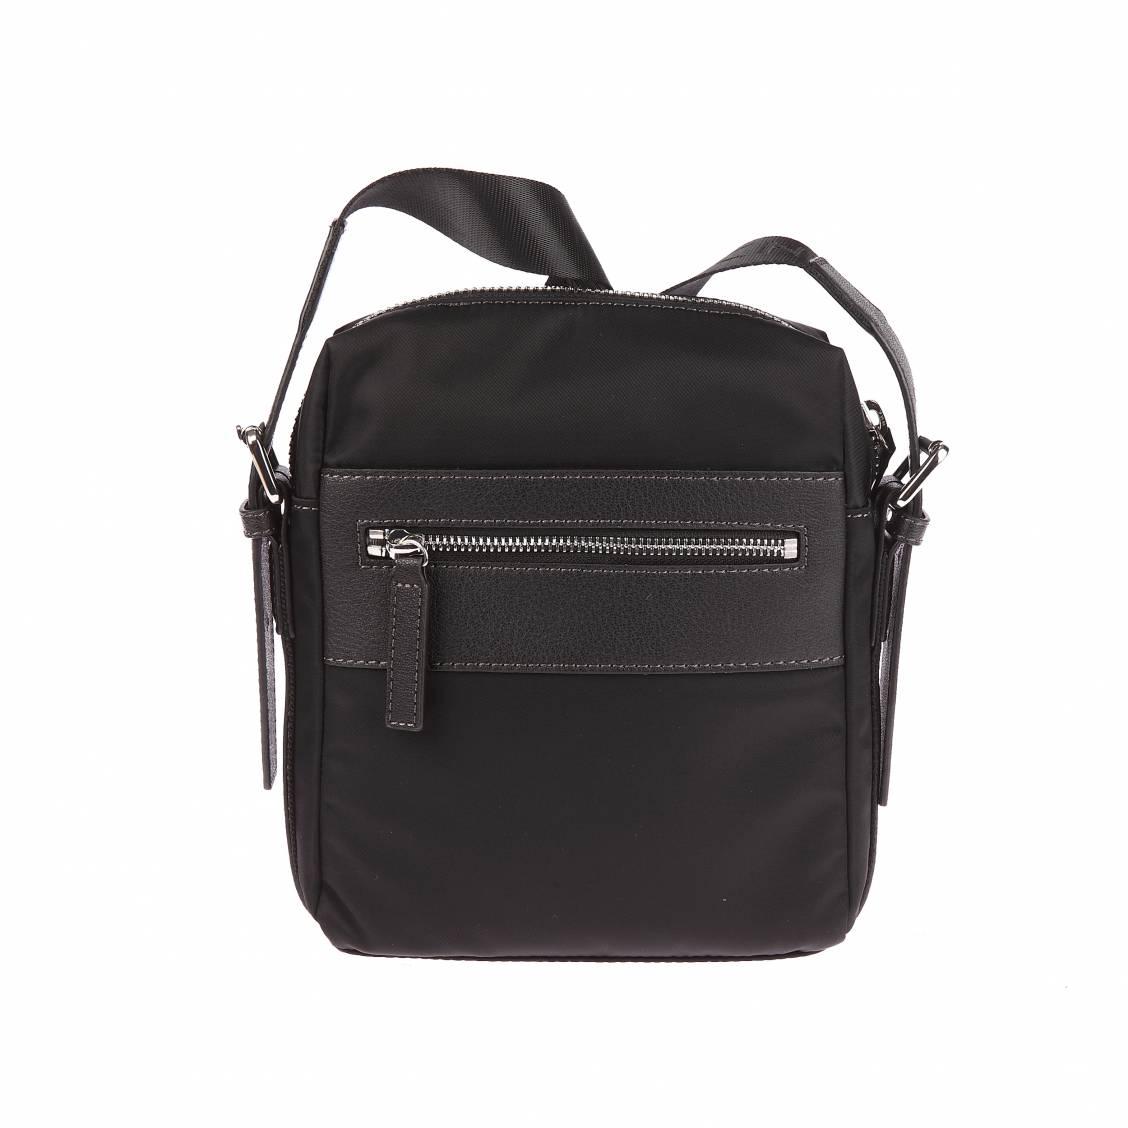 Petite sacoche à poches zippées Chabrand Noire cZ5zPQvMN6